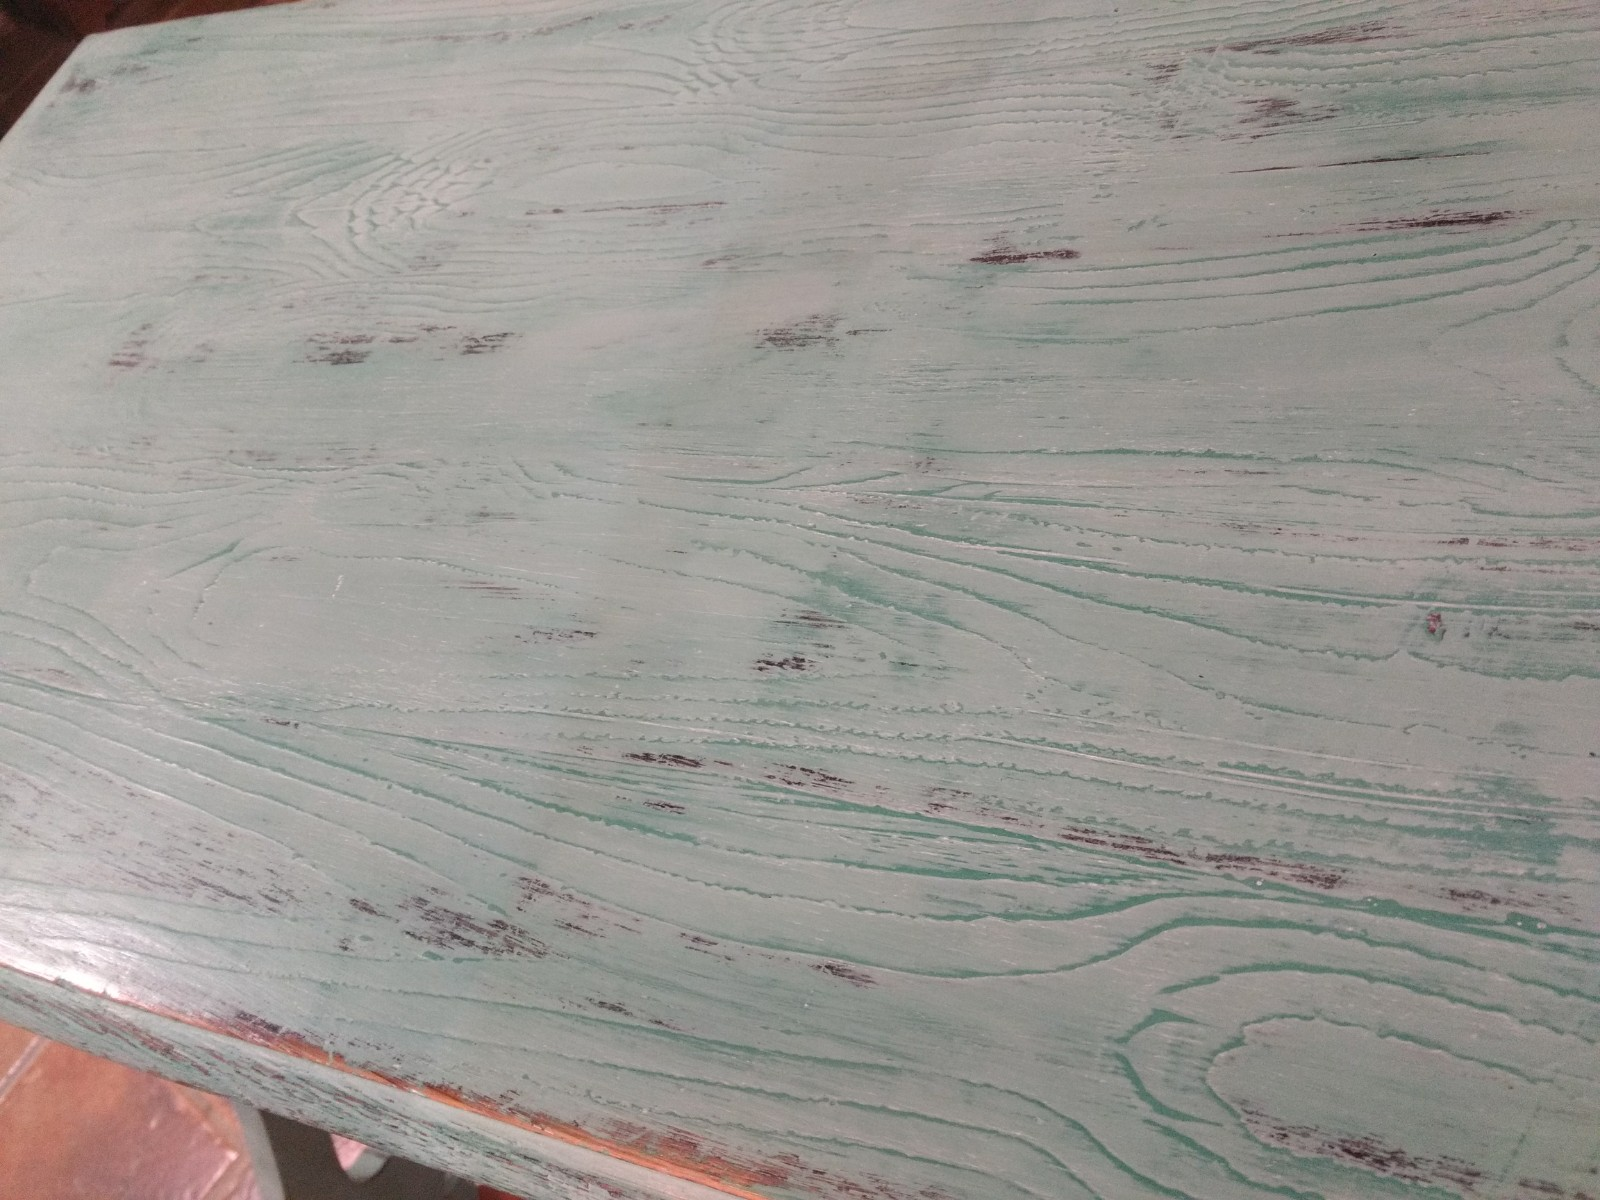 Veteado imitación madera con Chalk Paint Annie Sloan, provence, florence. Soft wax clear y white - TRATE Tienda Taller - Bilbao